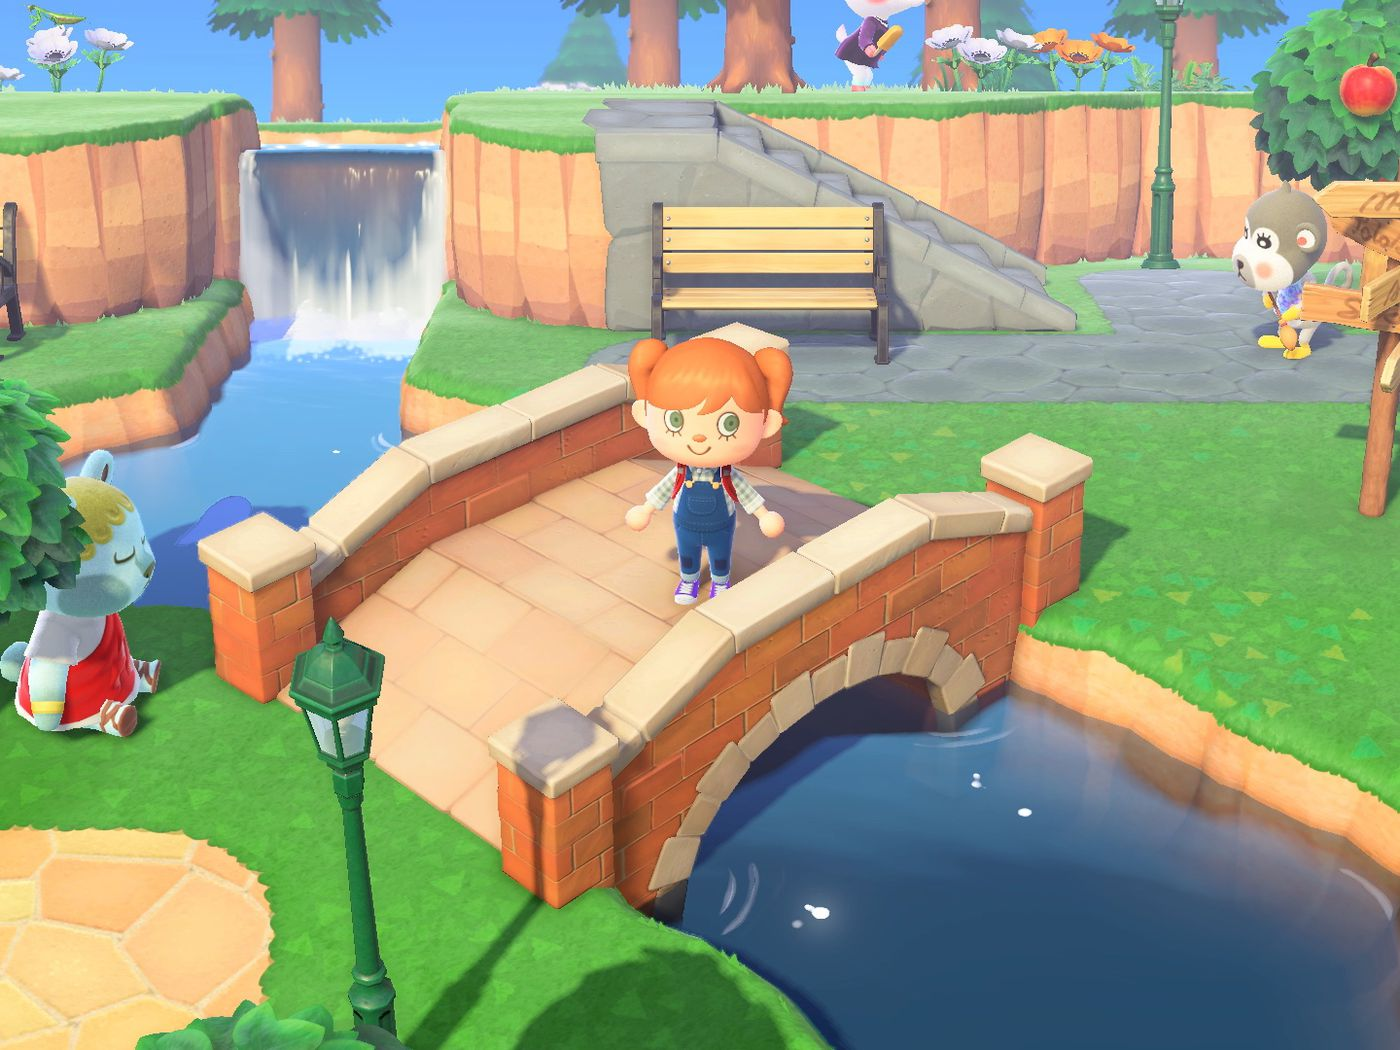 Animal Crossing New Horizon S Mysterious Gravestone Has Players Worried Polygon